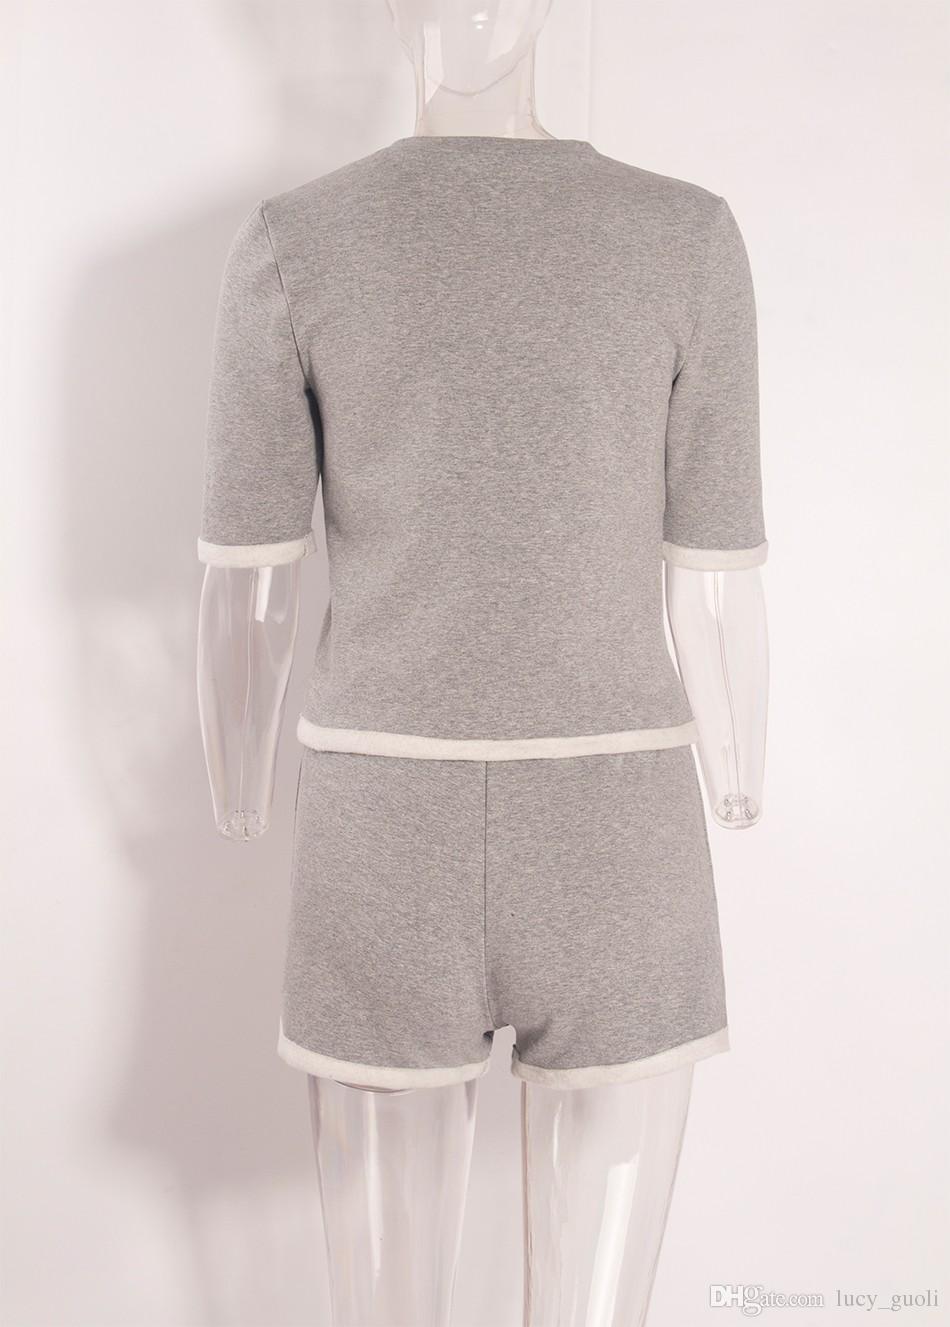 2016 casual Zwei Stücke Outfits Kurzarm Bodycon Sexy Grau Short Jumpsuit Frauen Body Suit Crop Top und Kurze Hosen Playsuits Aktive Frauen